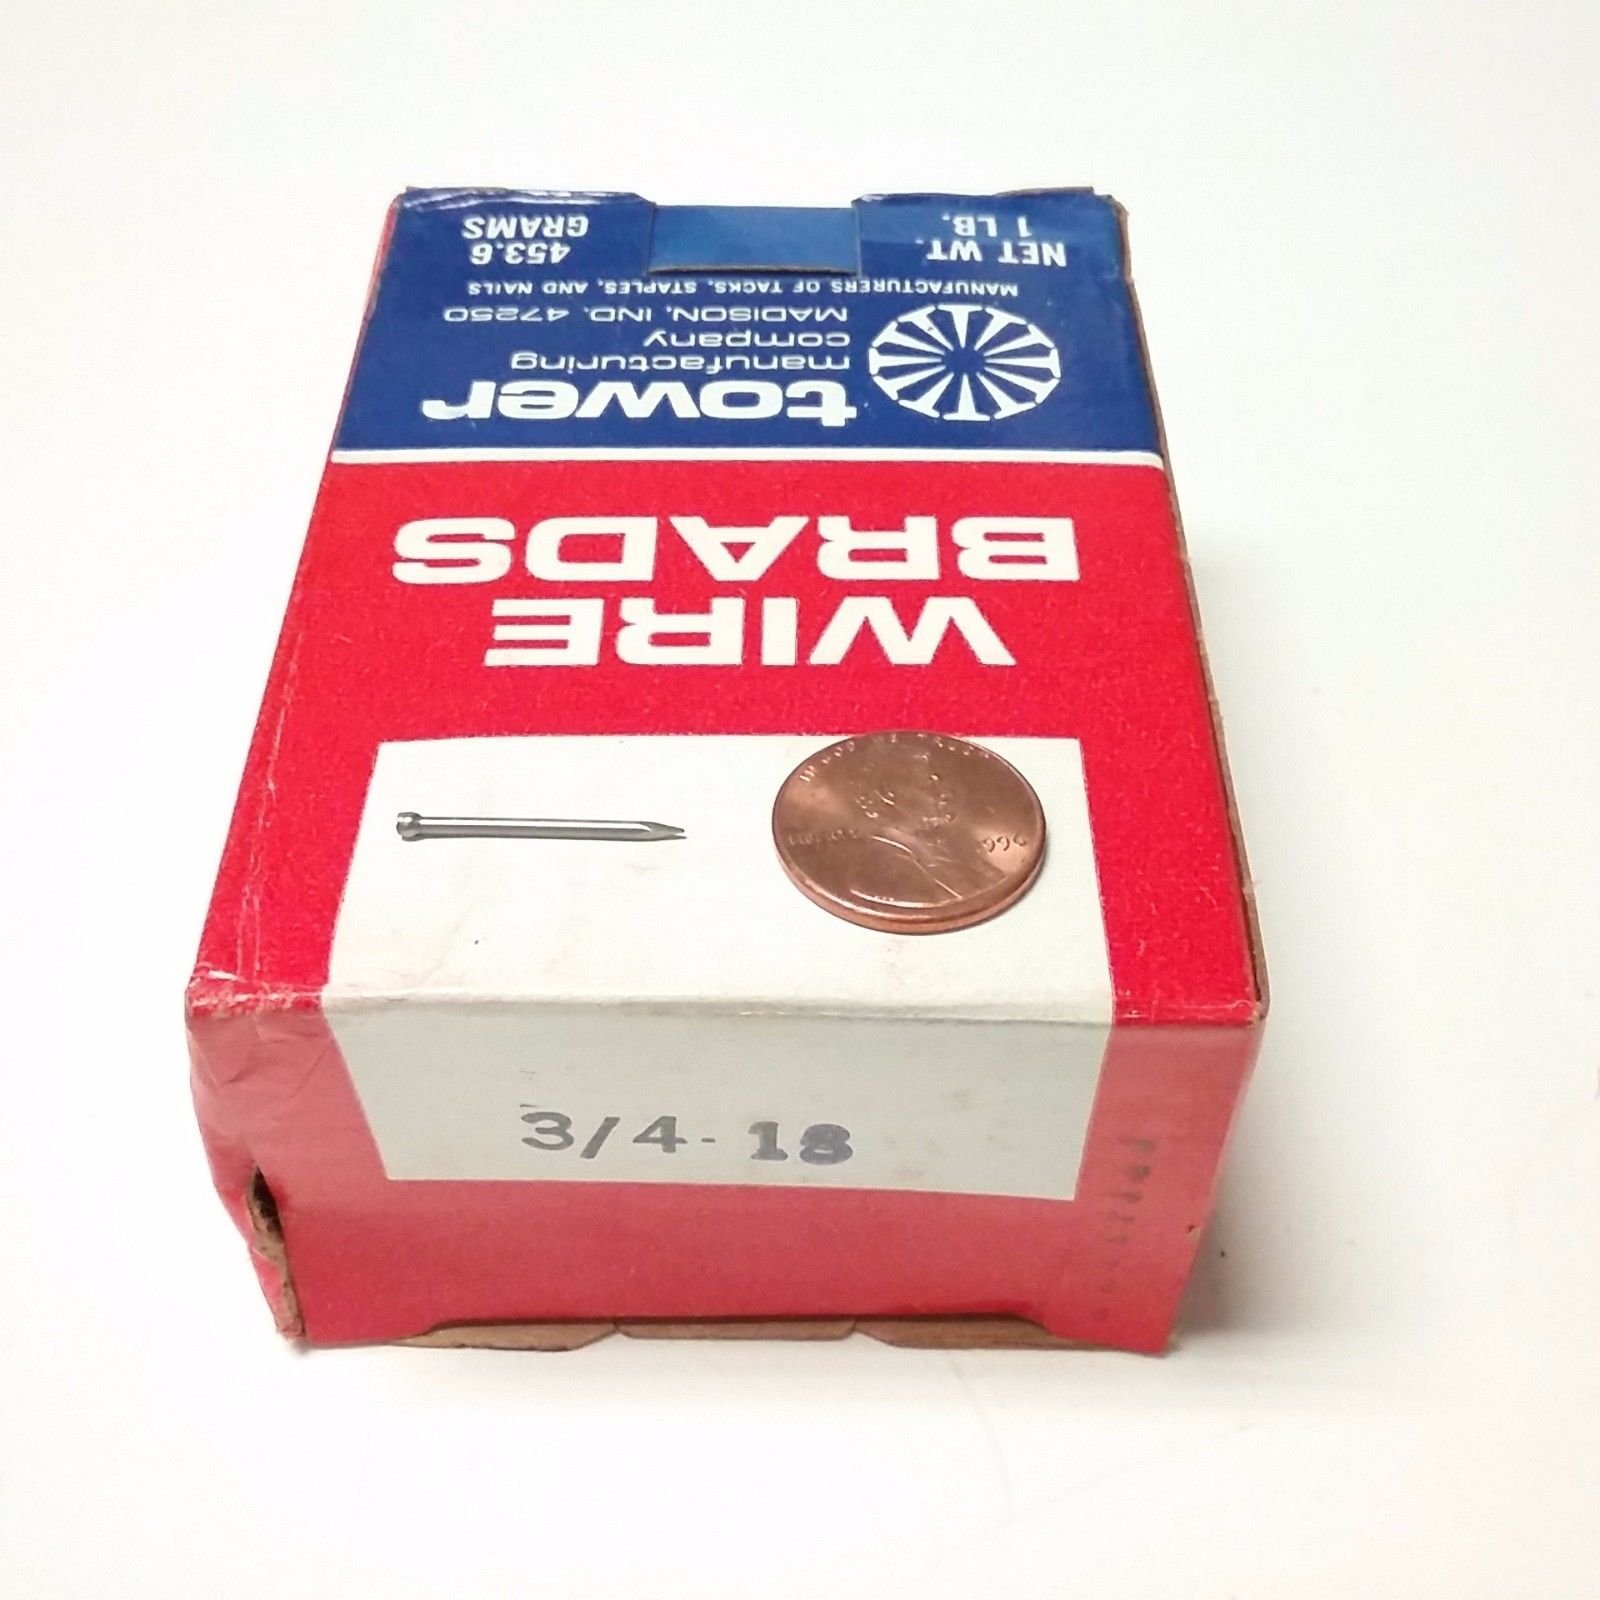 1 Lb. Box of 3/4'' - 18 Ga. Wire Brads - Tower Manufacturing Company - USA